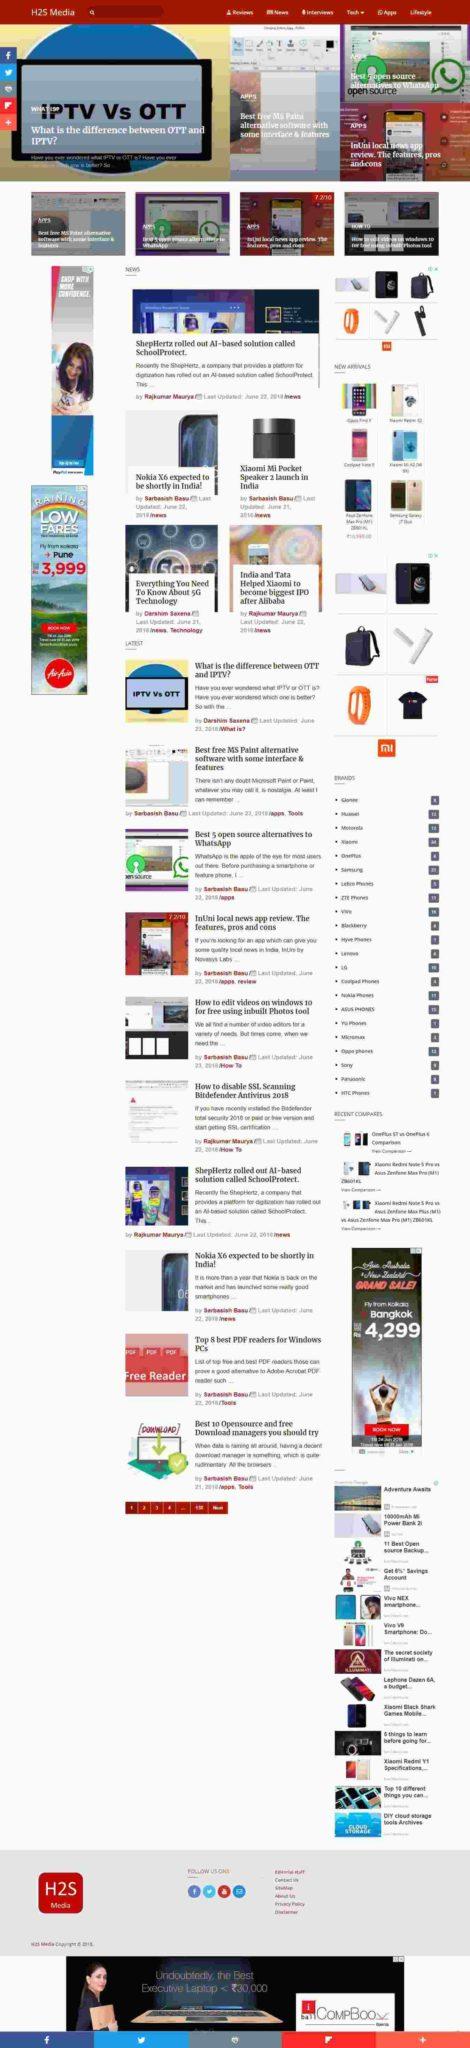 scrolling screenshot windows 10